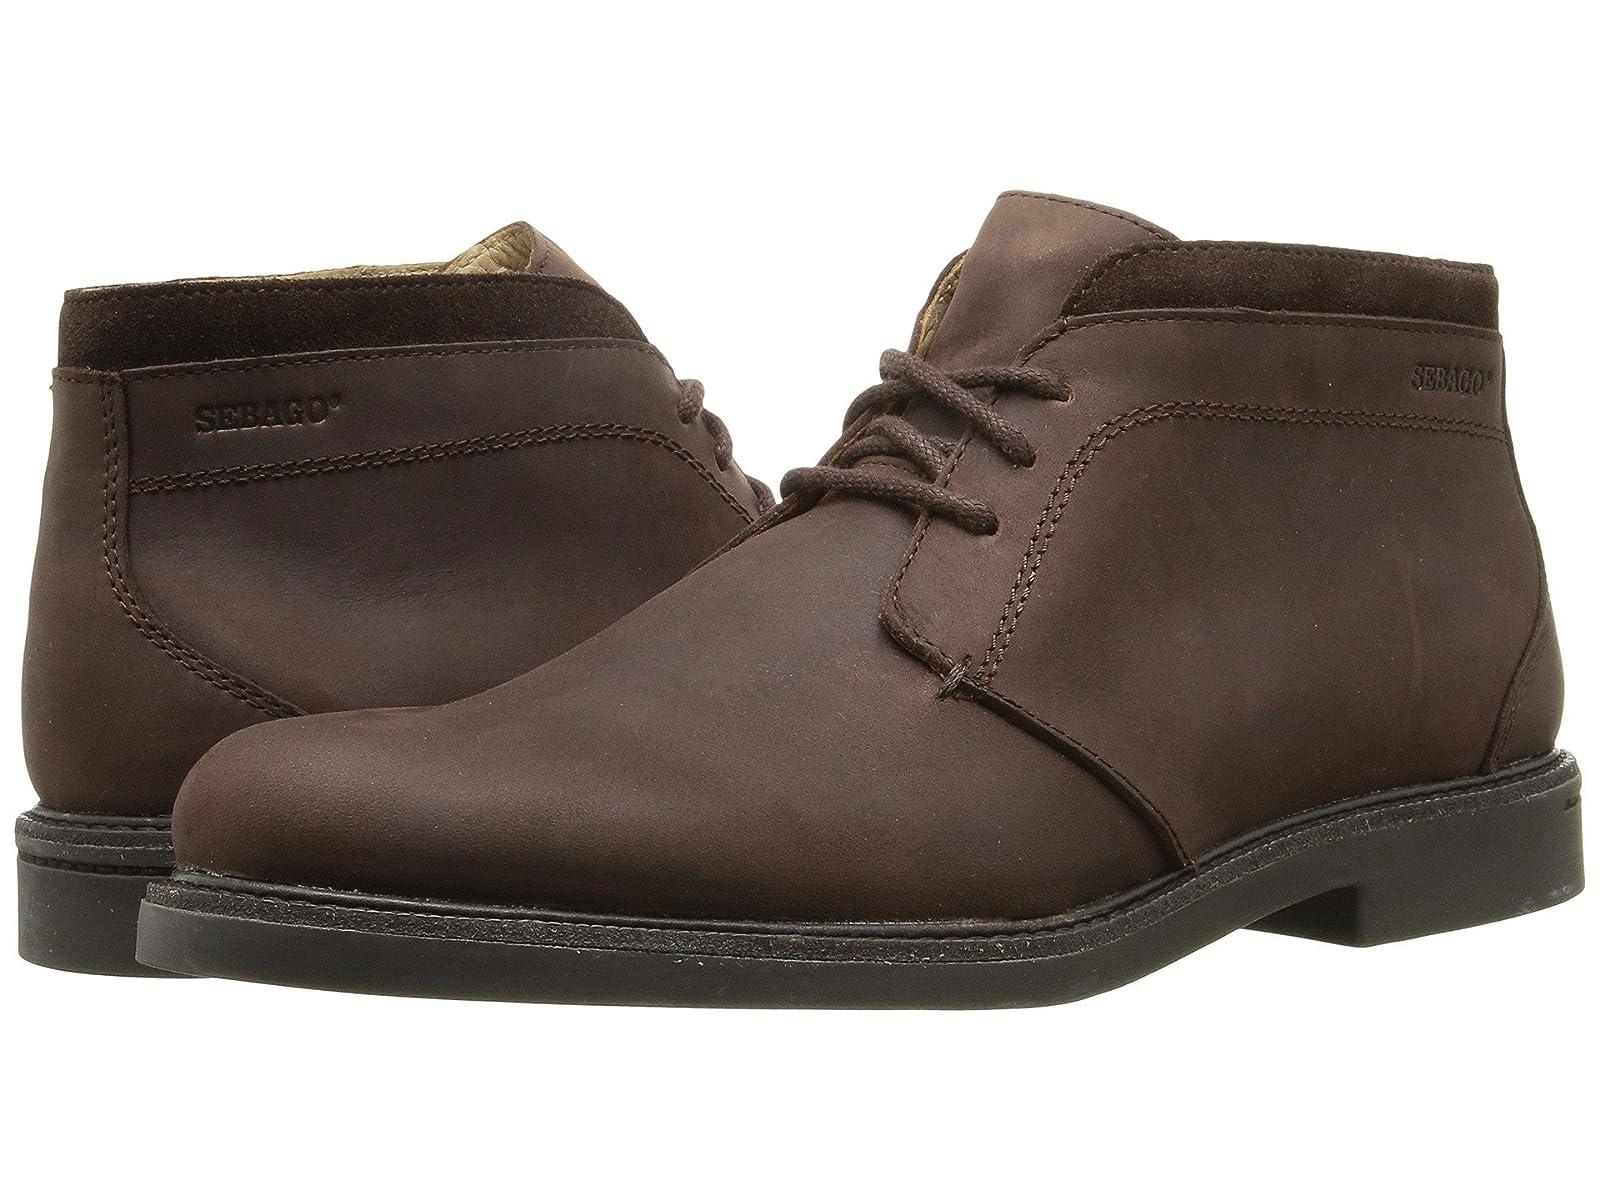 Sebago Turner Chukka WaterproofCheap and distinctive eye-catching shoes